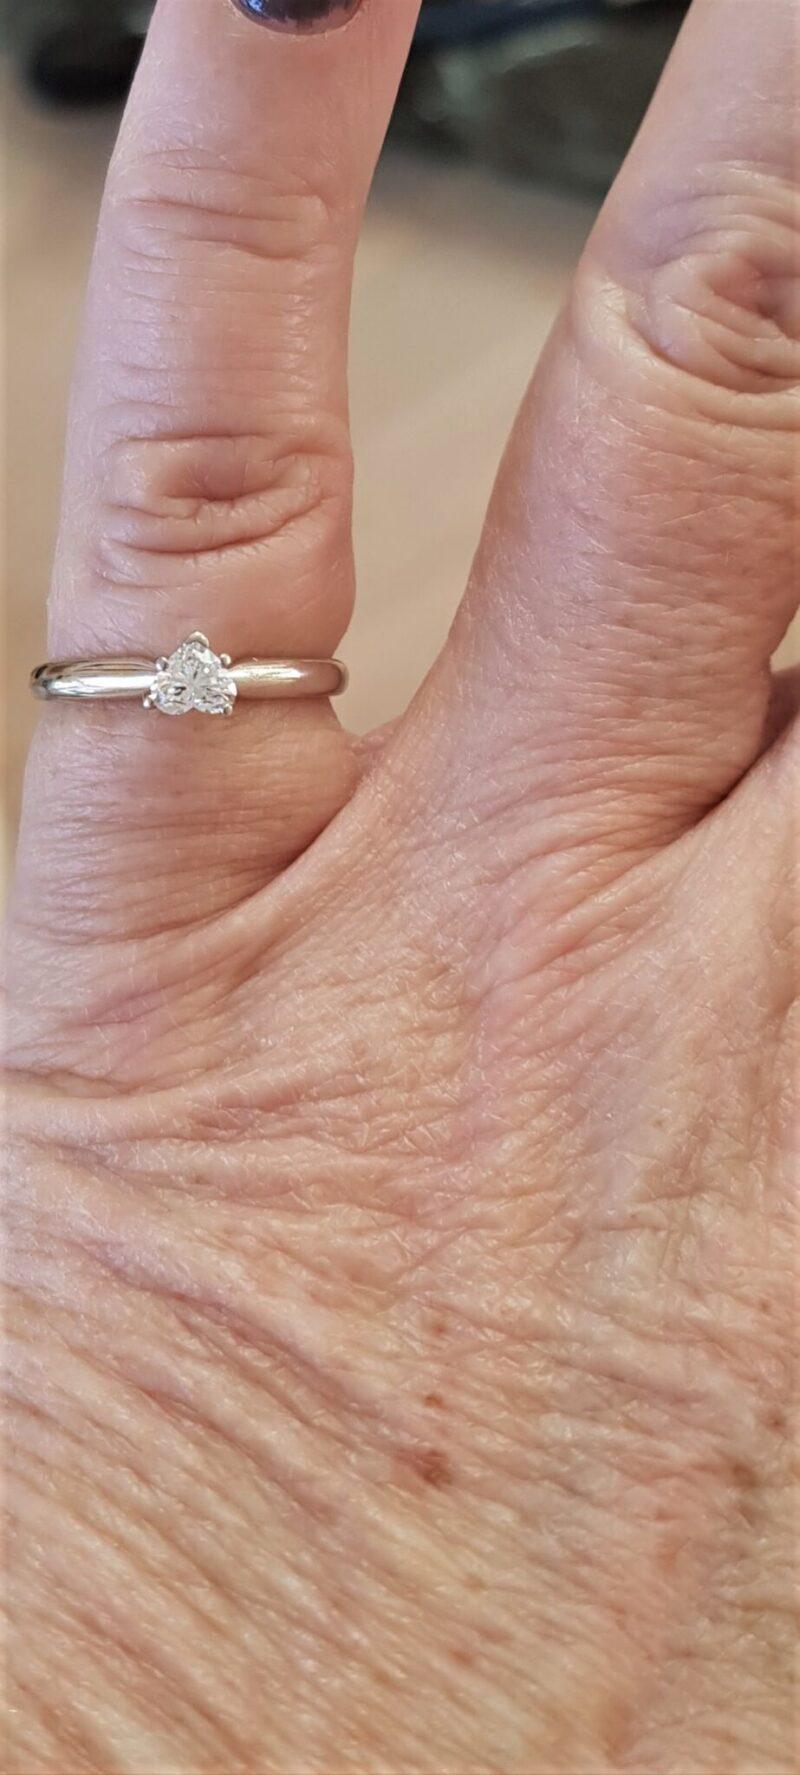 Hjerte Diamant på Total 0,28 Karat i 14 Karat Guld ring.